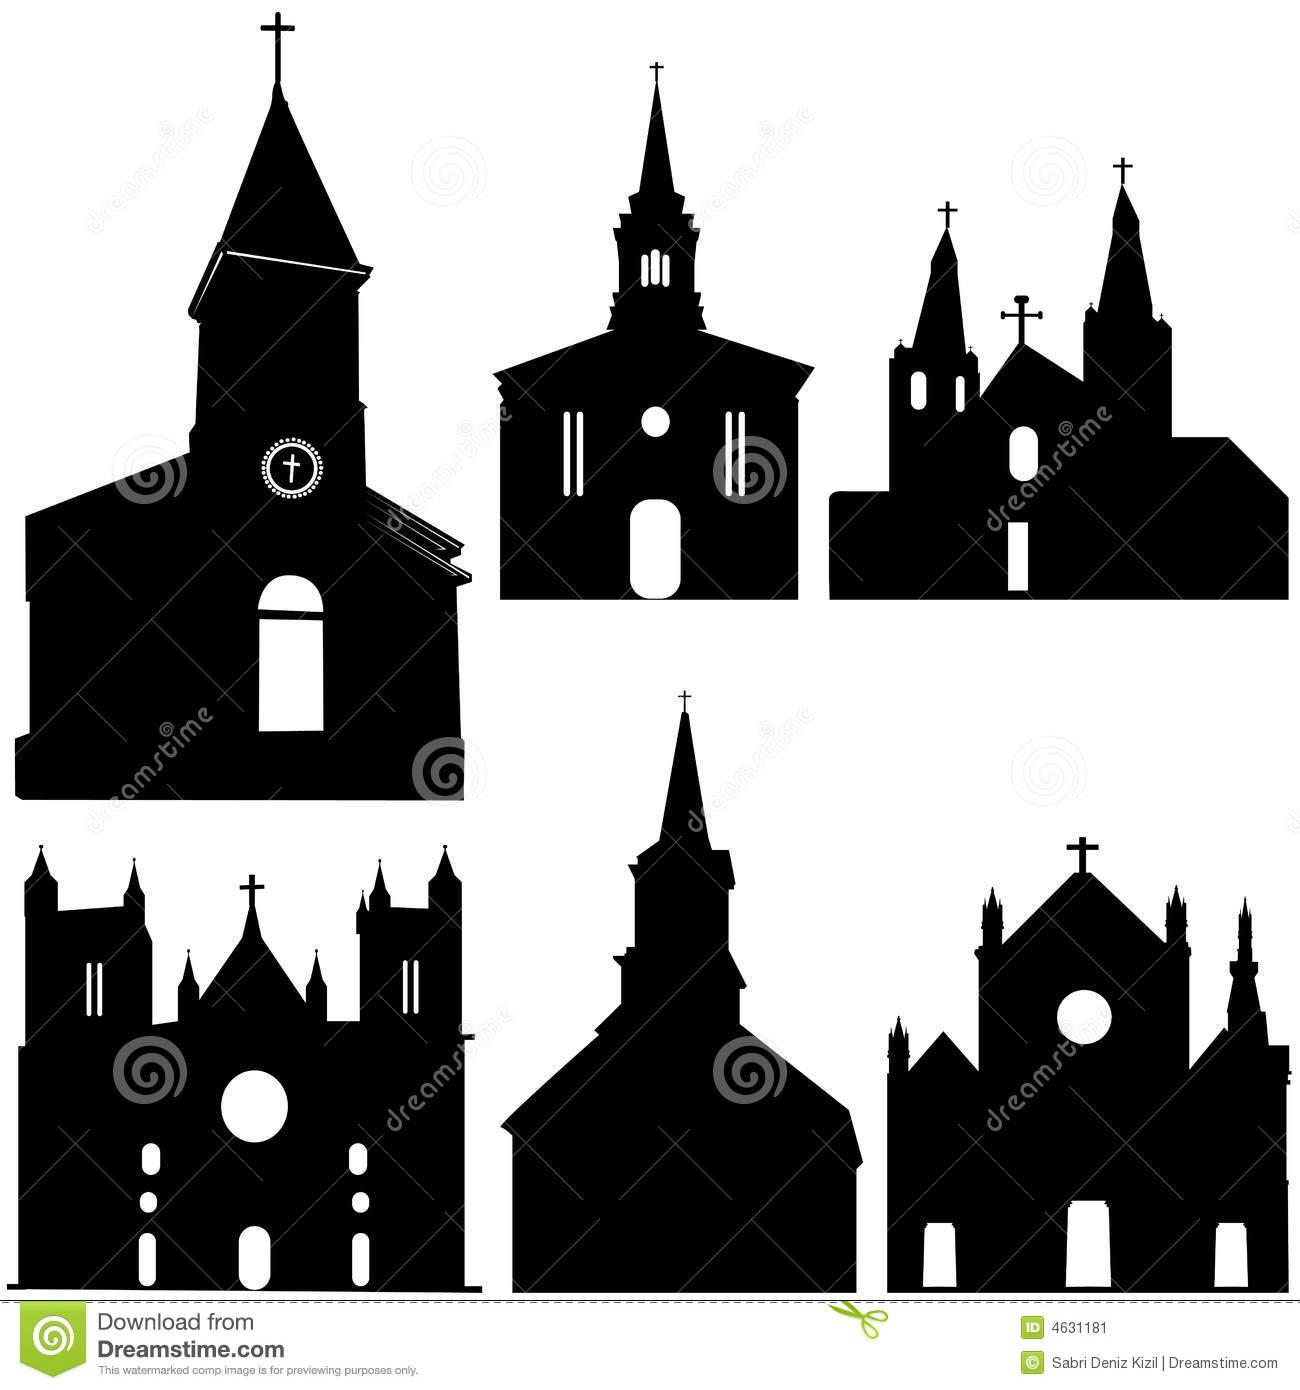 9 Church Vector Art Images